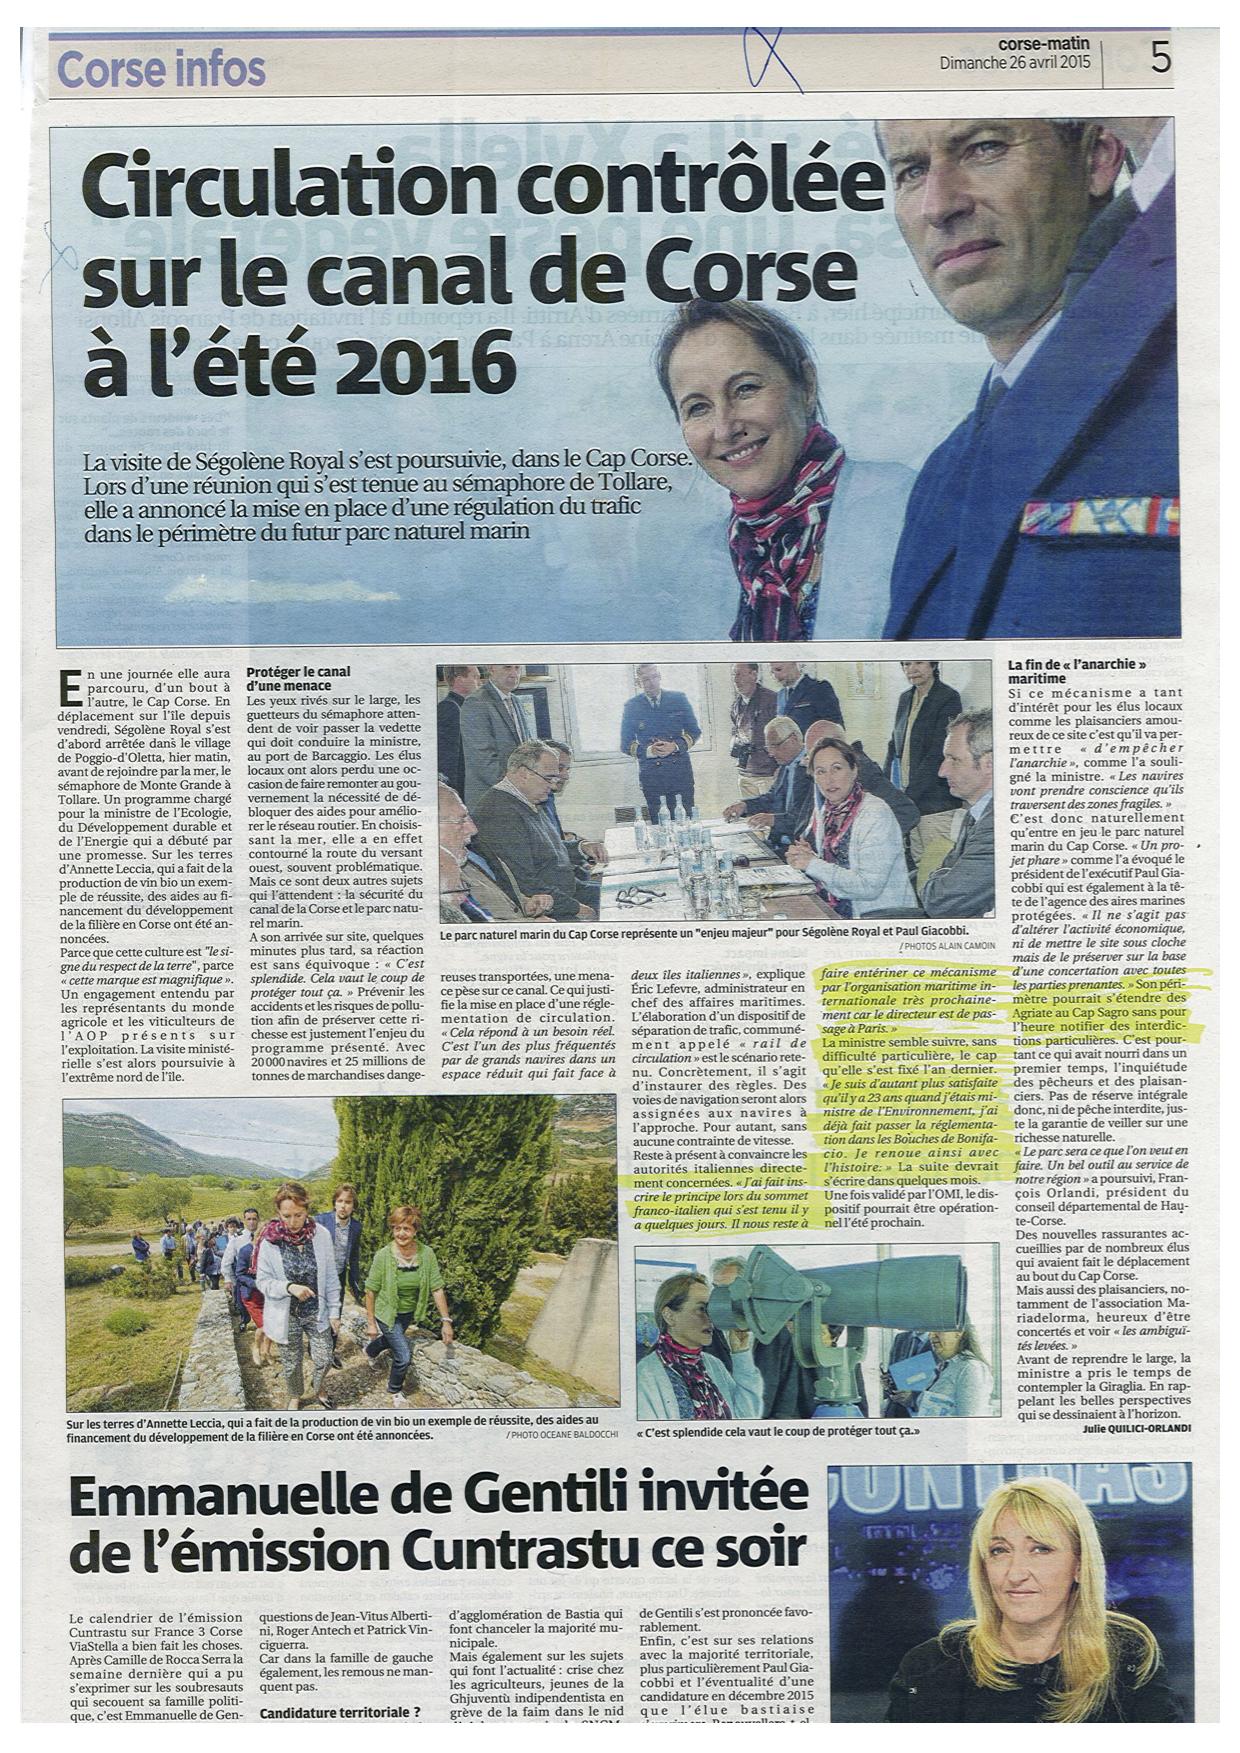 SÉMAPHORE - CAP CORSE (CORSE DU NORD) - Page 2 942015ArticleCorseMatinCapCorse260415